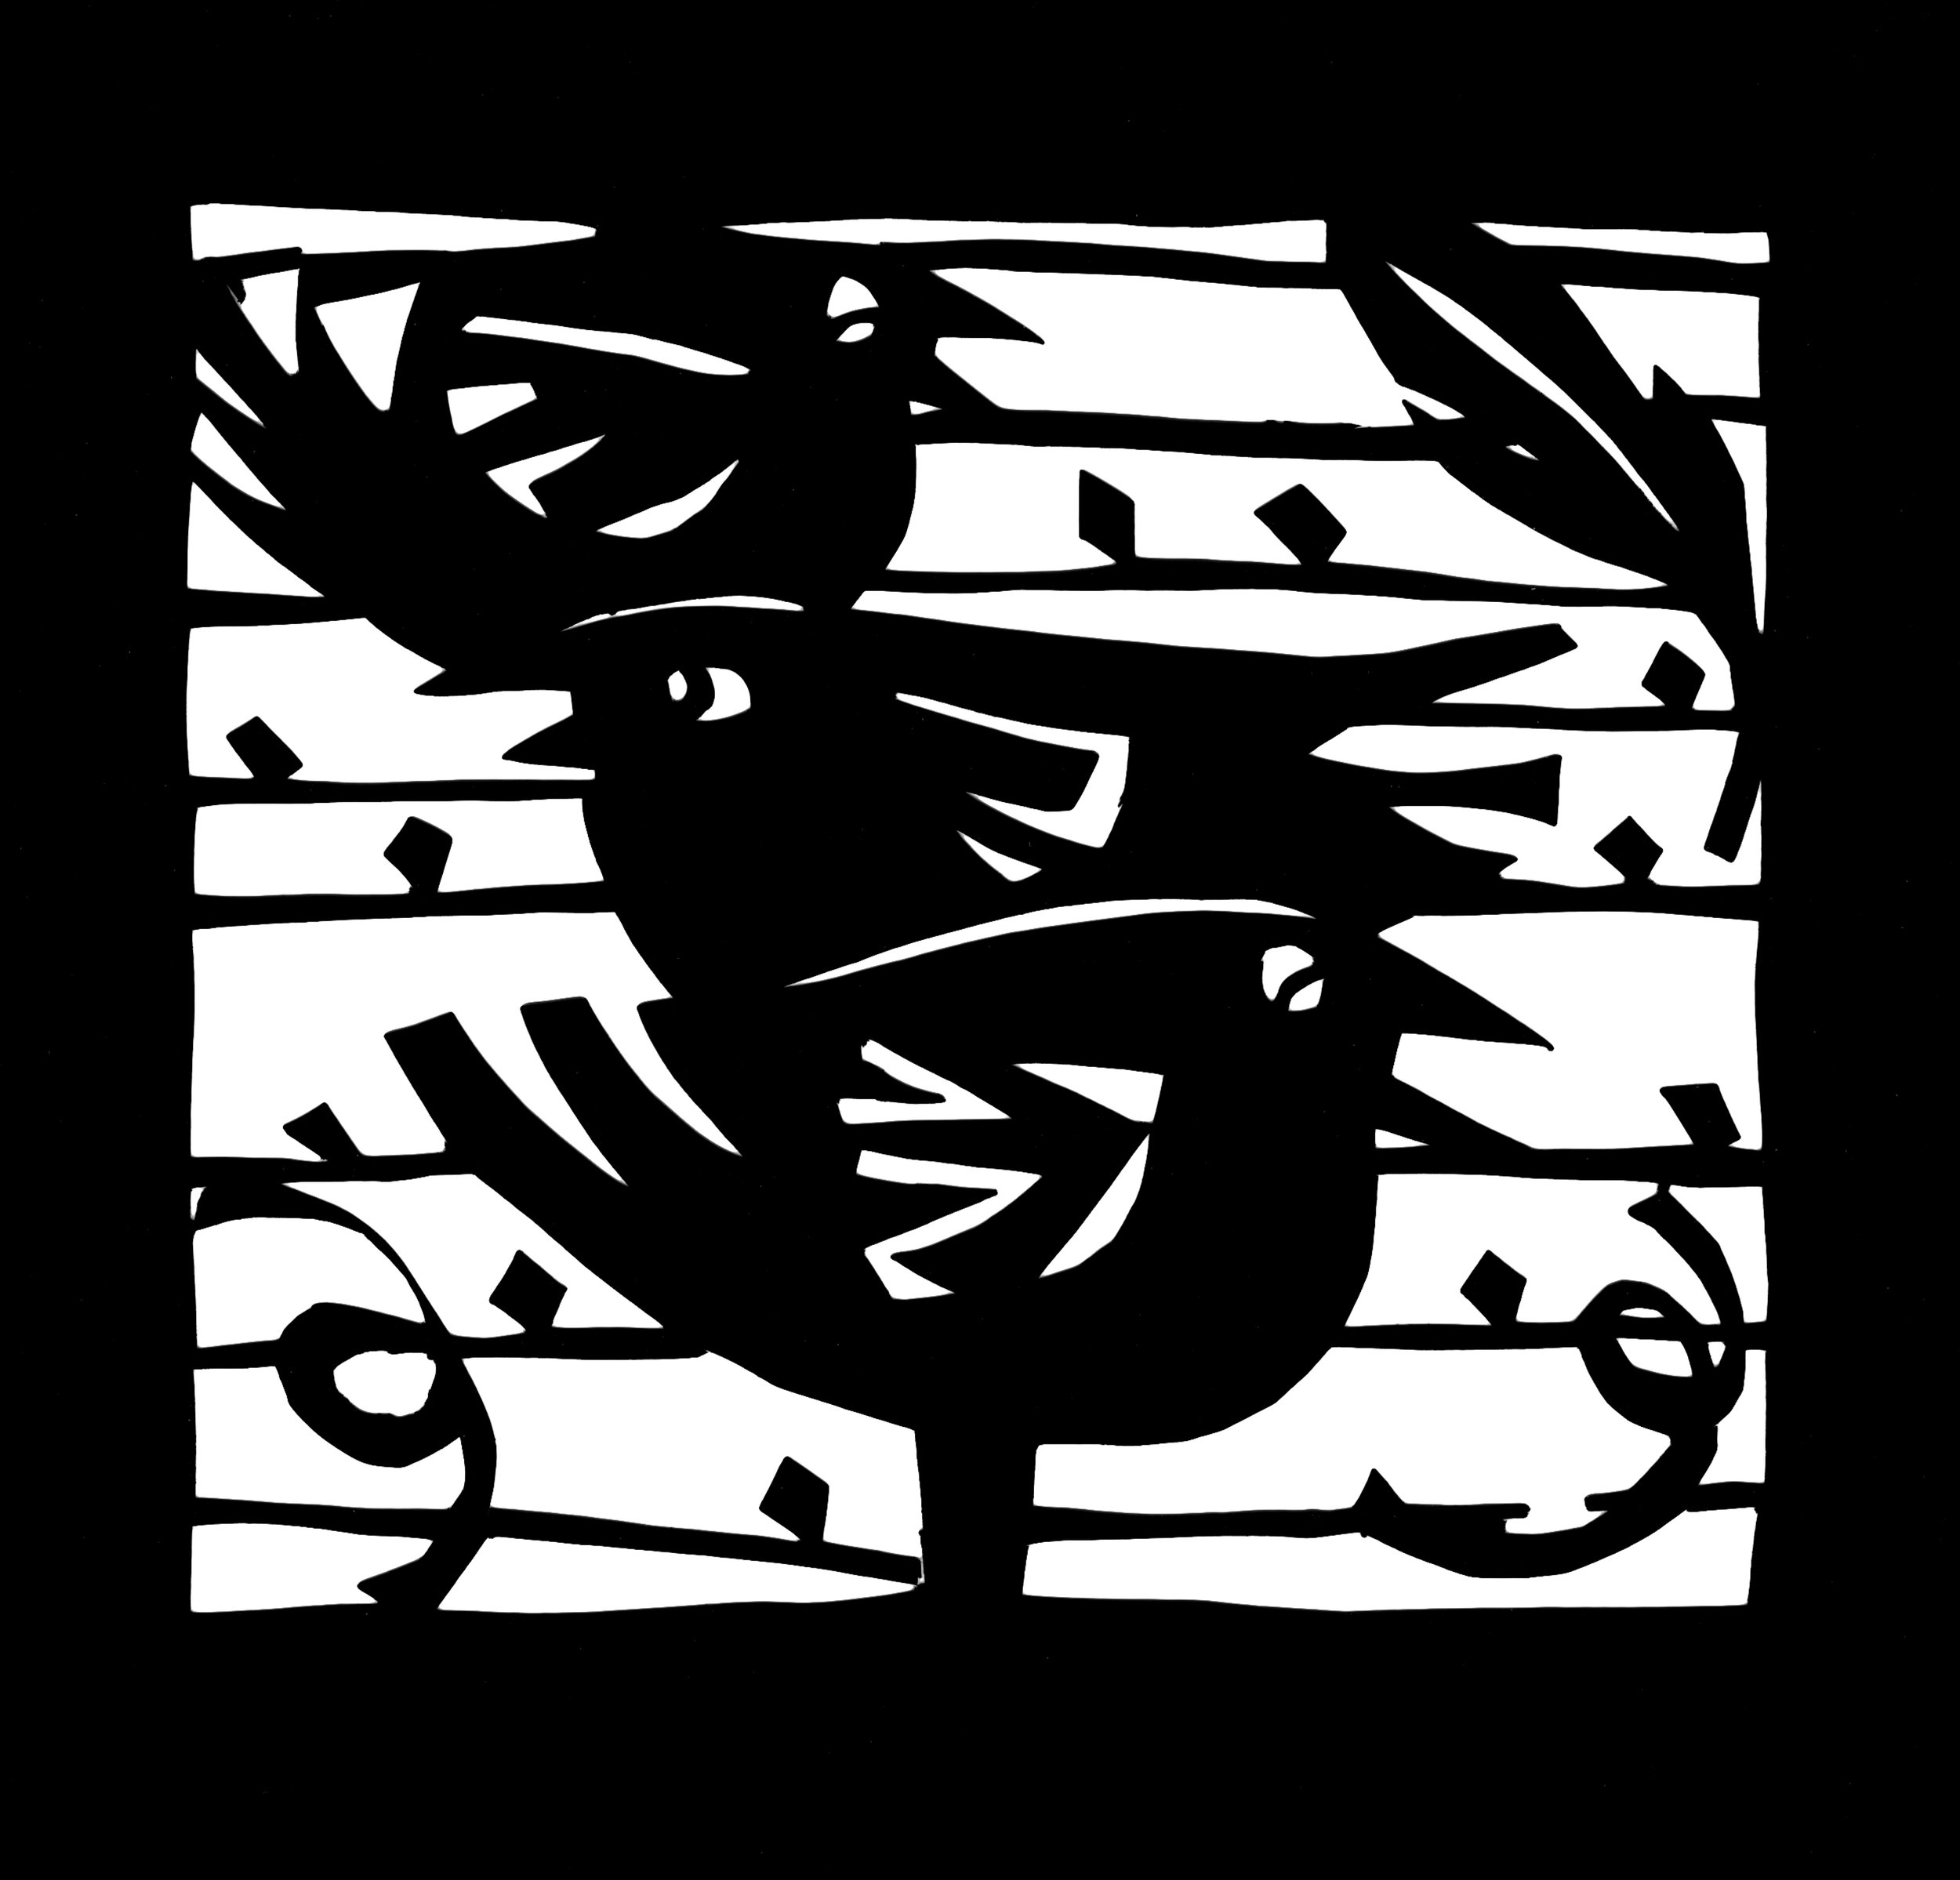 bird_song-Edit.jpg